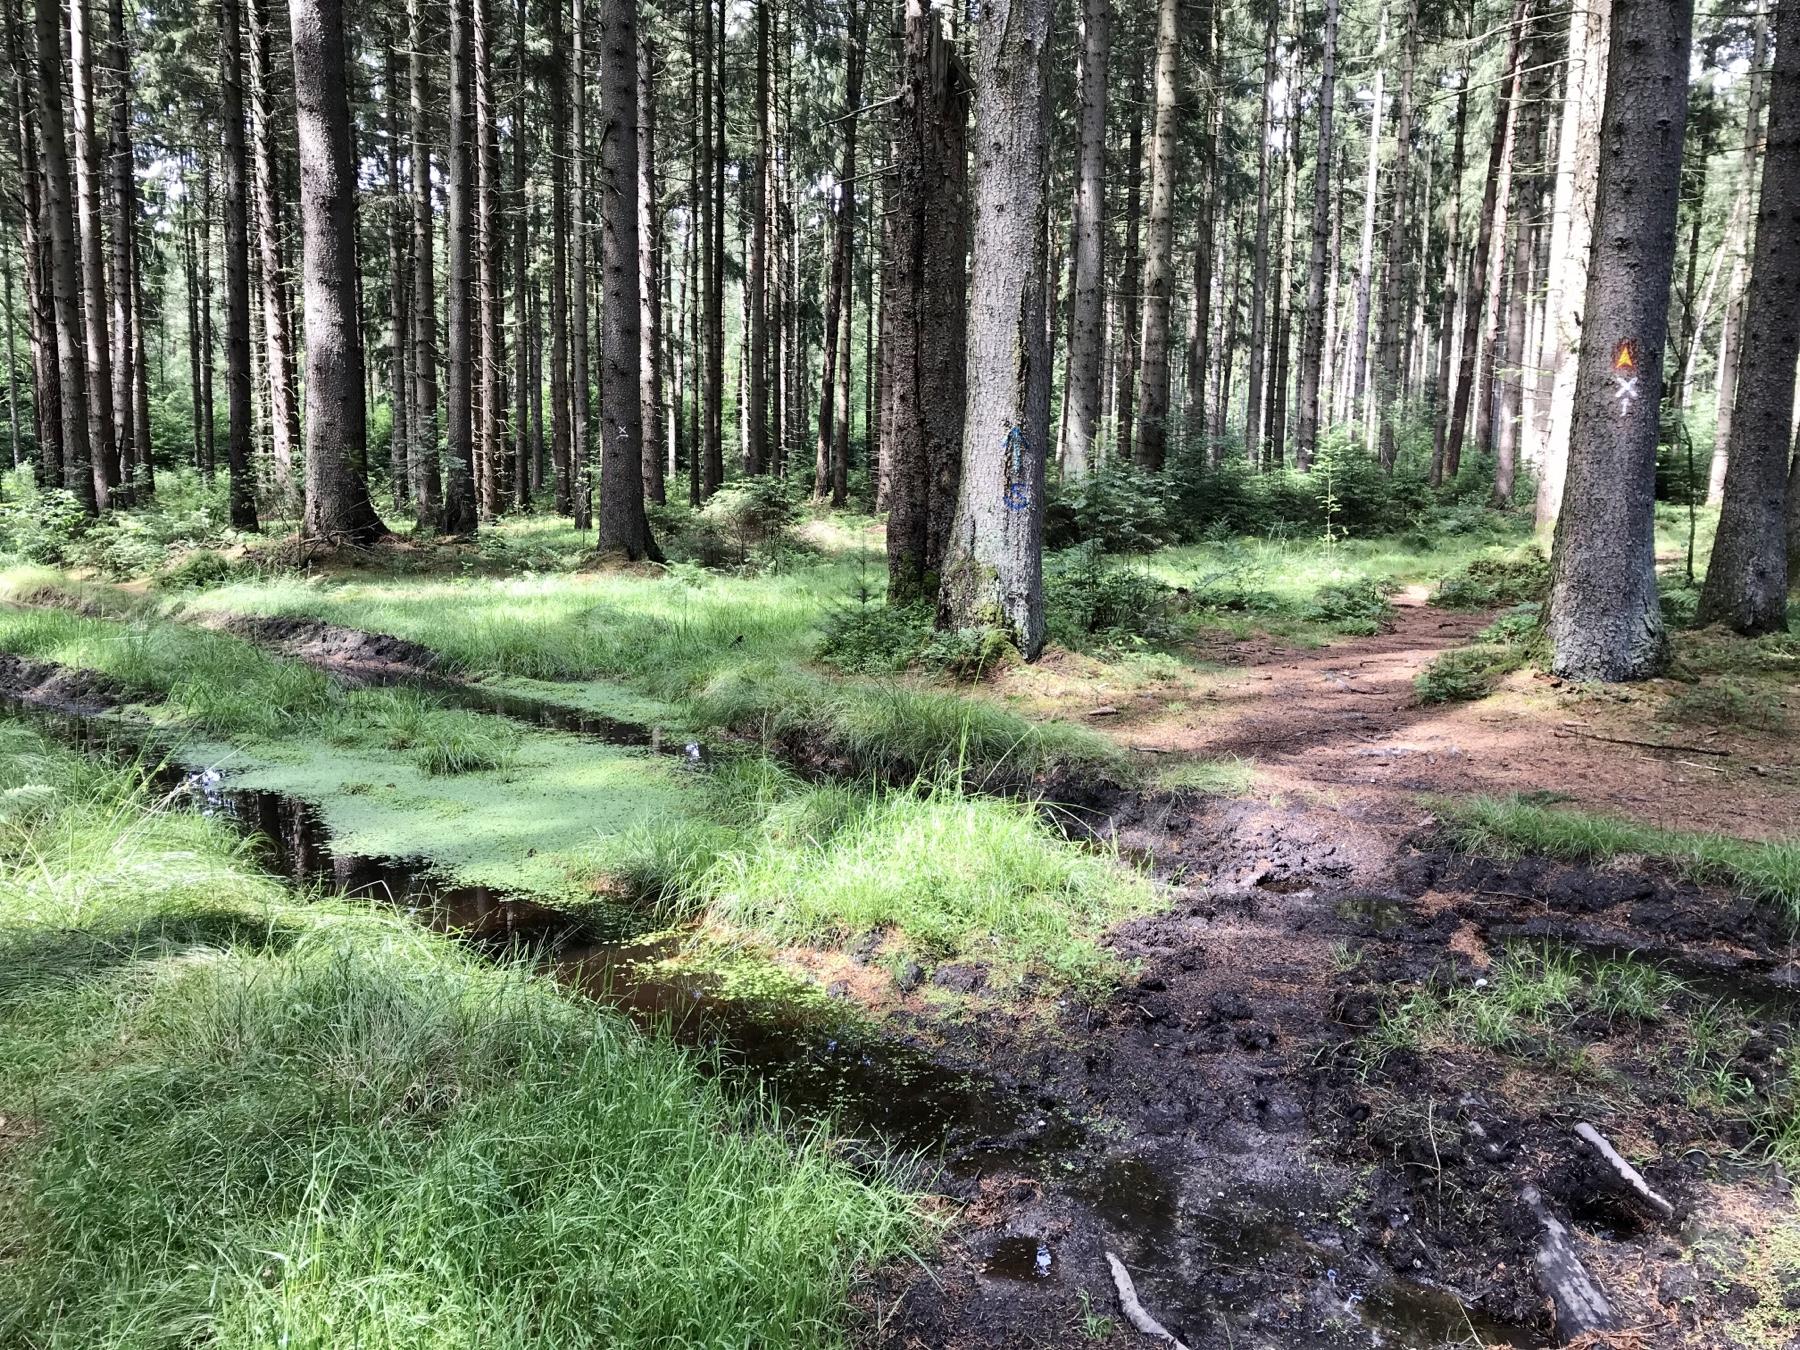 Pfützenlandschaft Sachsenwald Aumühle Stormarnweg Etappe 1